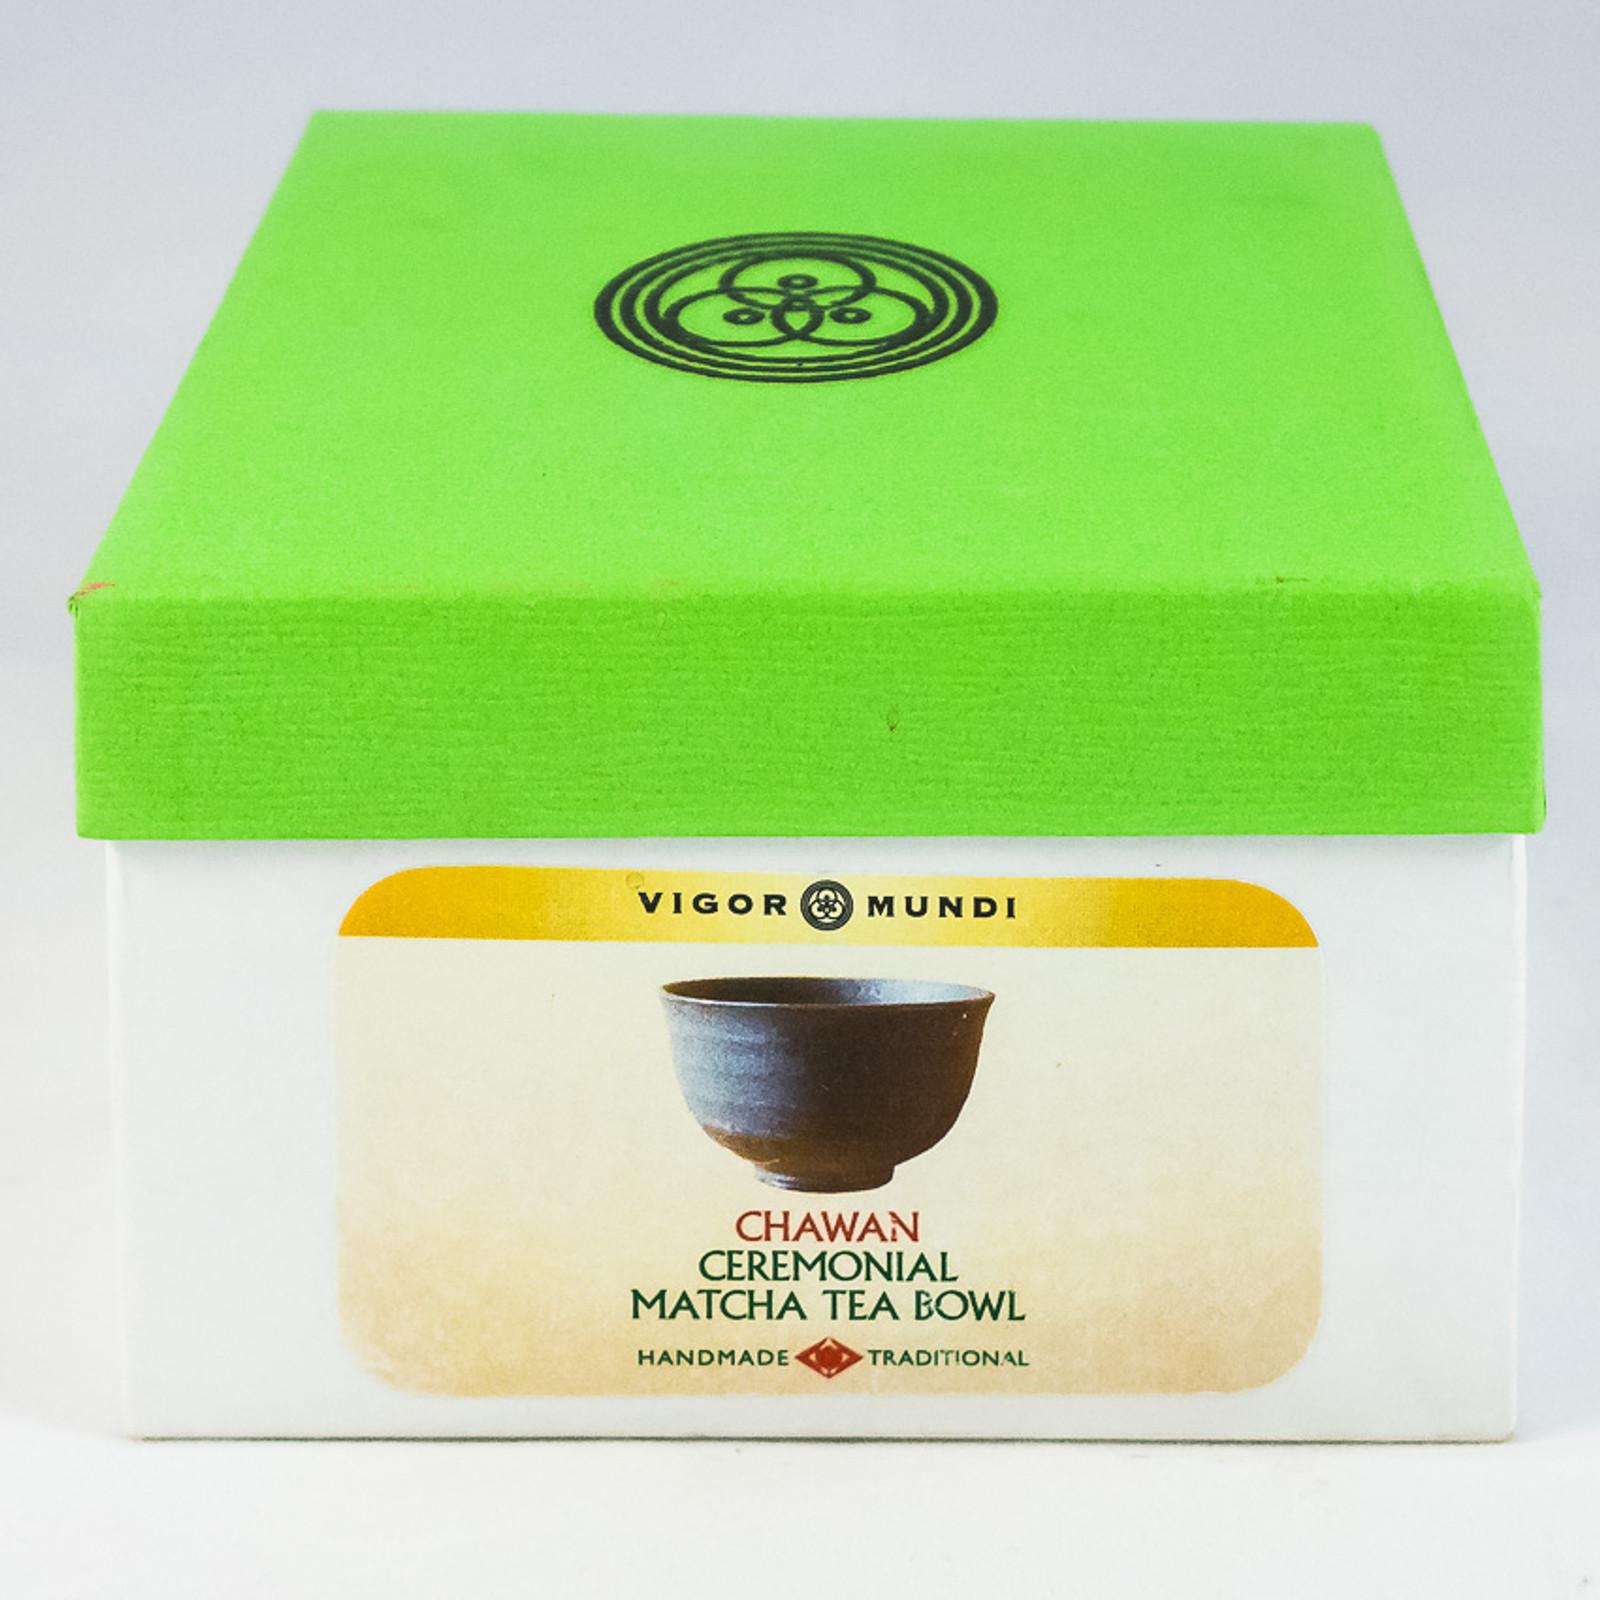 Handmade Chawan - Ceremonial Matcha Tea Bowl